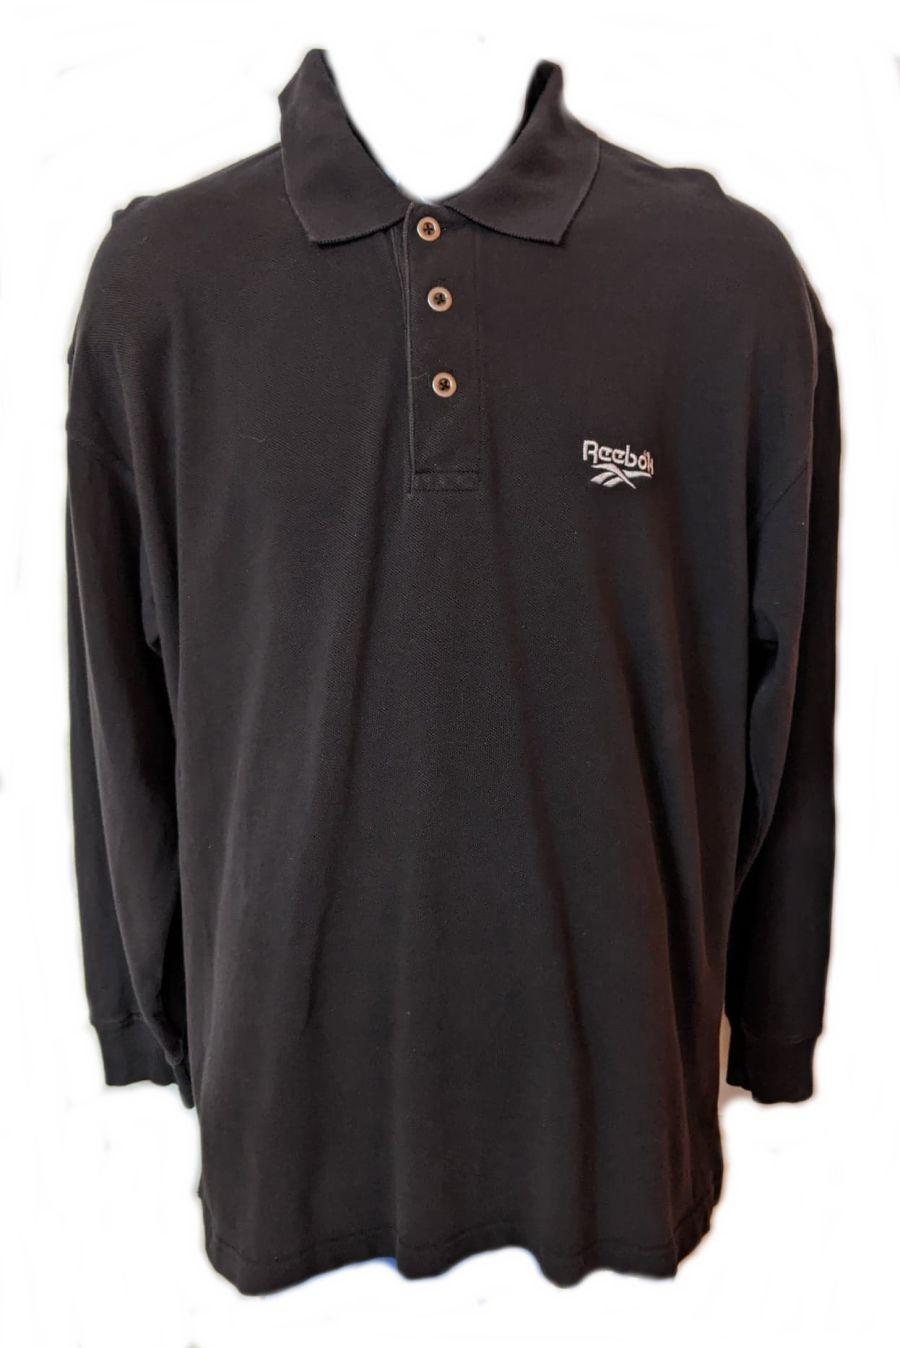 Vintage 1990's Reebok Golf Long Sleeve Sports Top